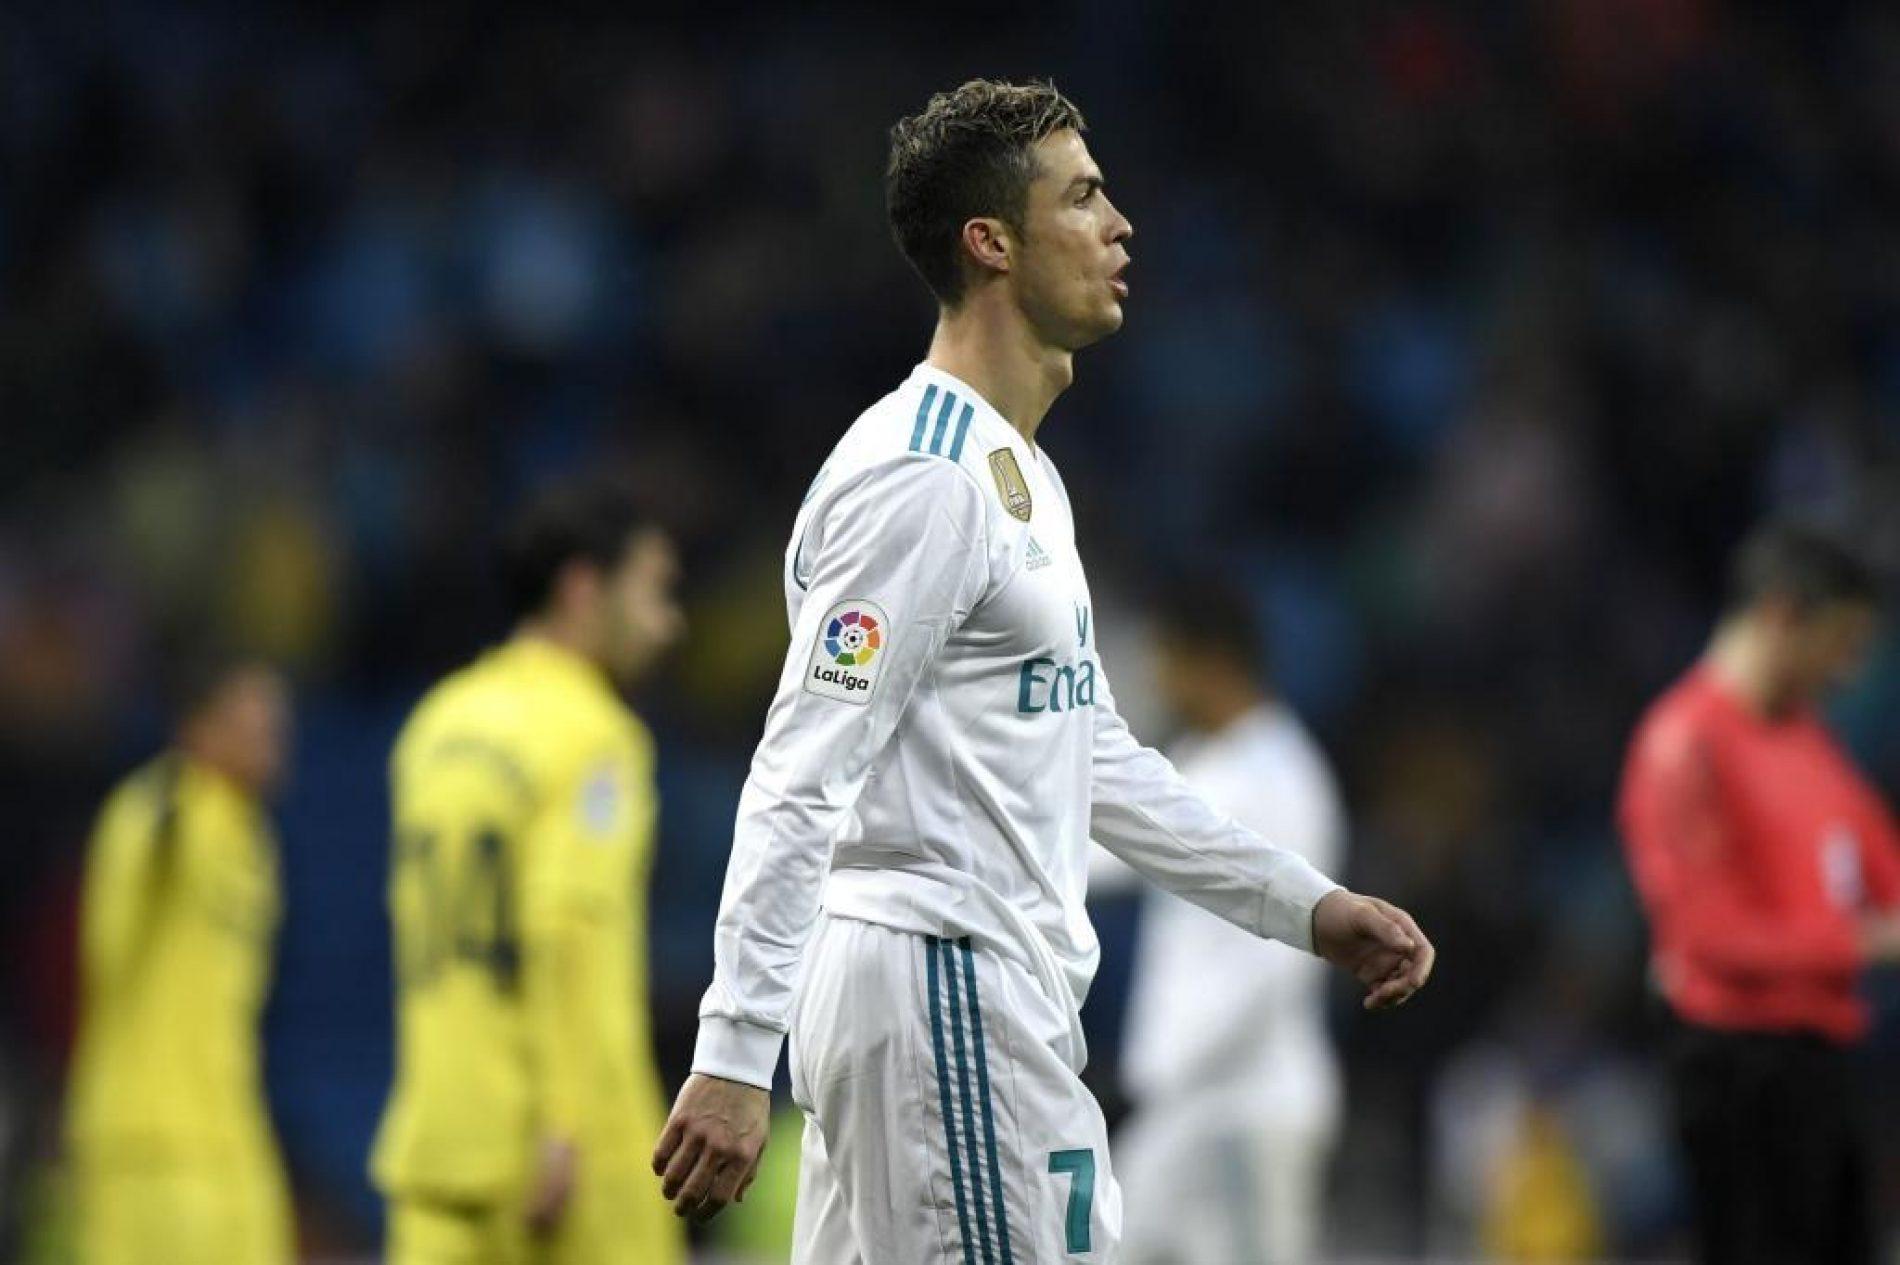 Liga, Real Madrid in piena crisi. Il Villarreal vince al Bernabeu